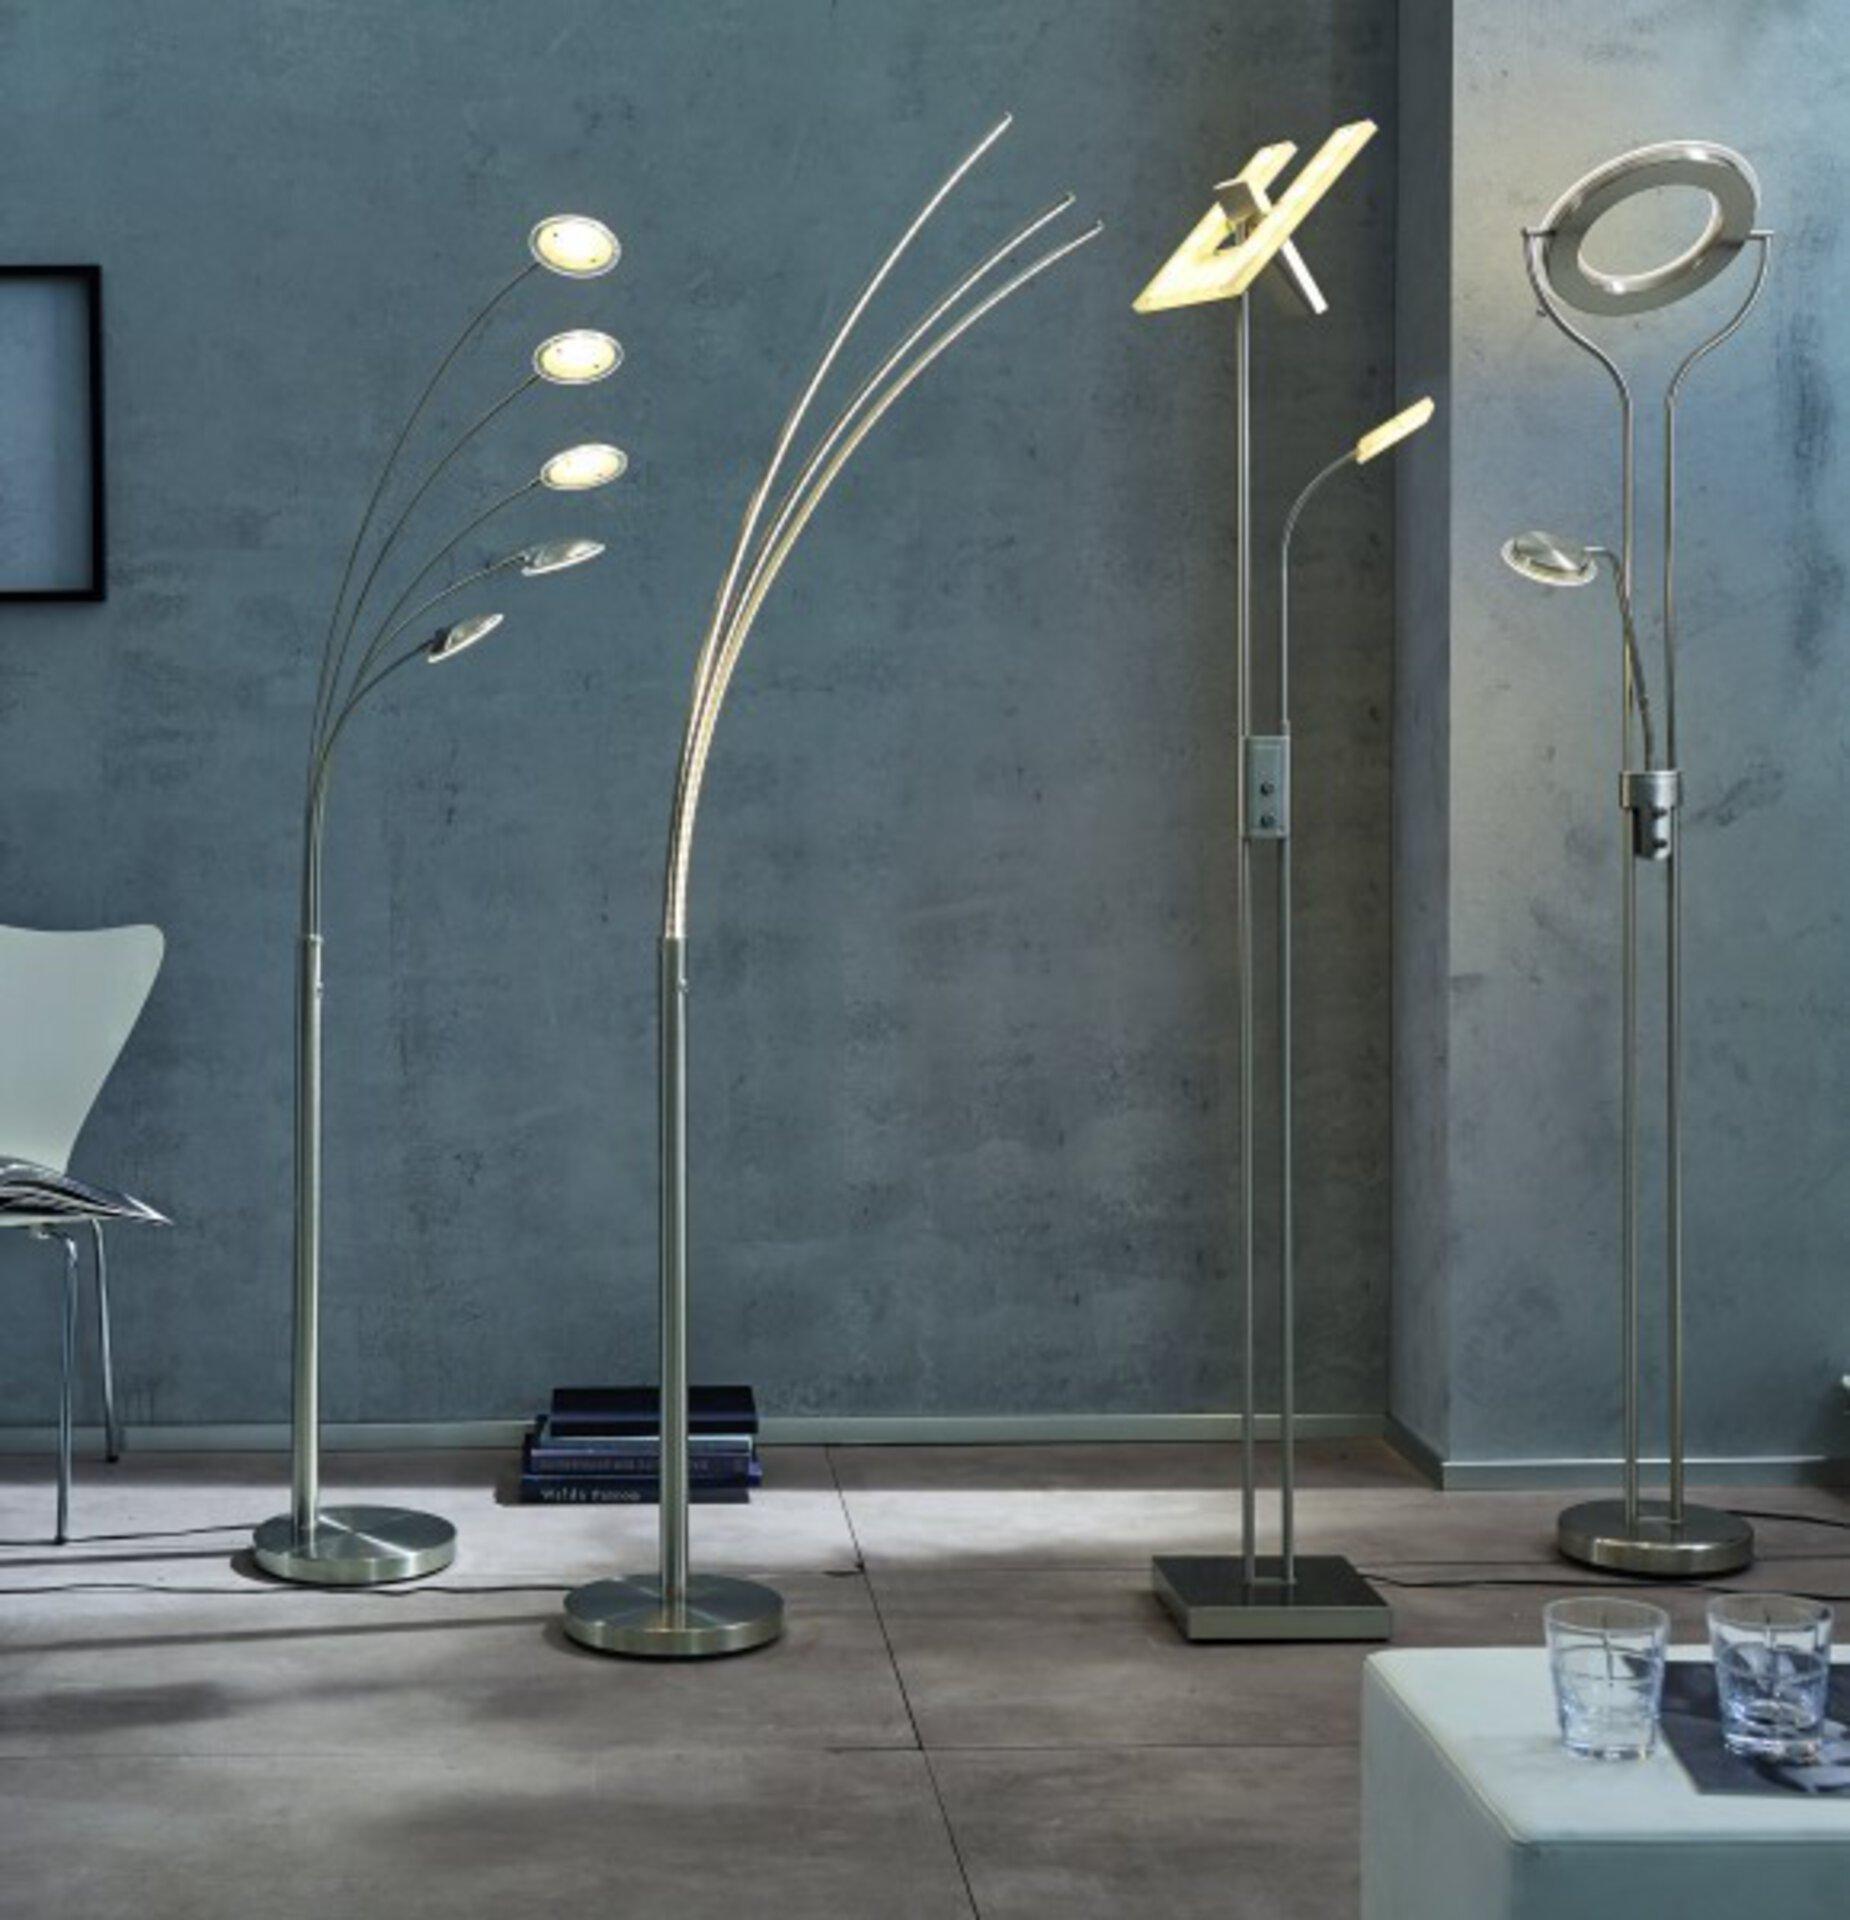 Stehleuchte Seattle Casa Nova Metall 30 x 180 x 35 cm